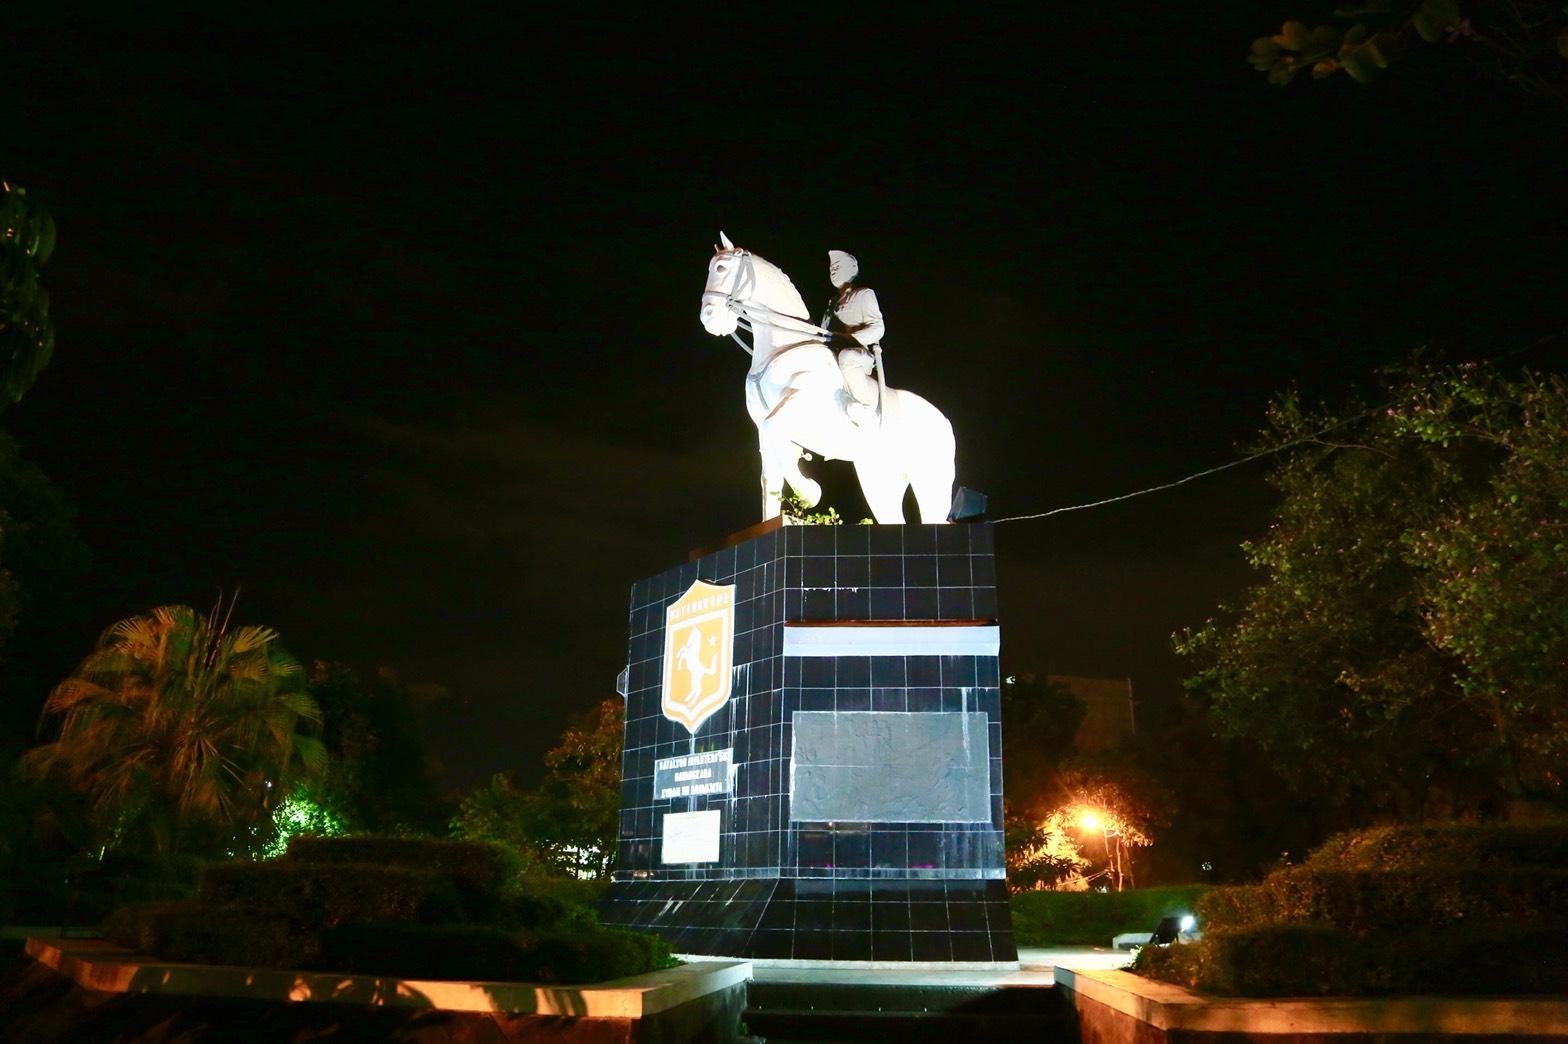 Mengulas 3 Monumen Bersejarah Kota Pahlawan Qubicle Djarot Soebijantoro Mantan